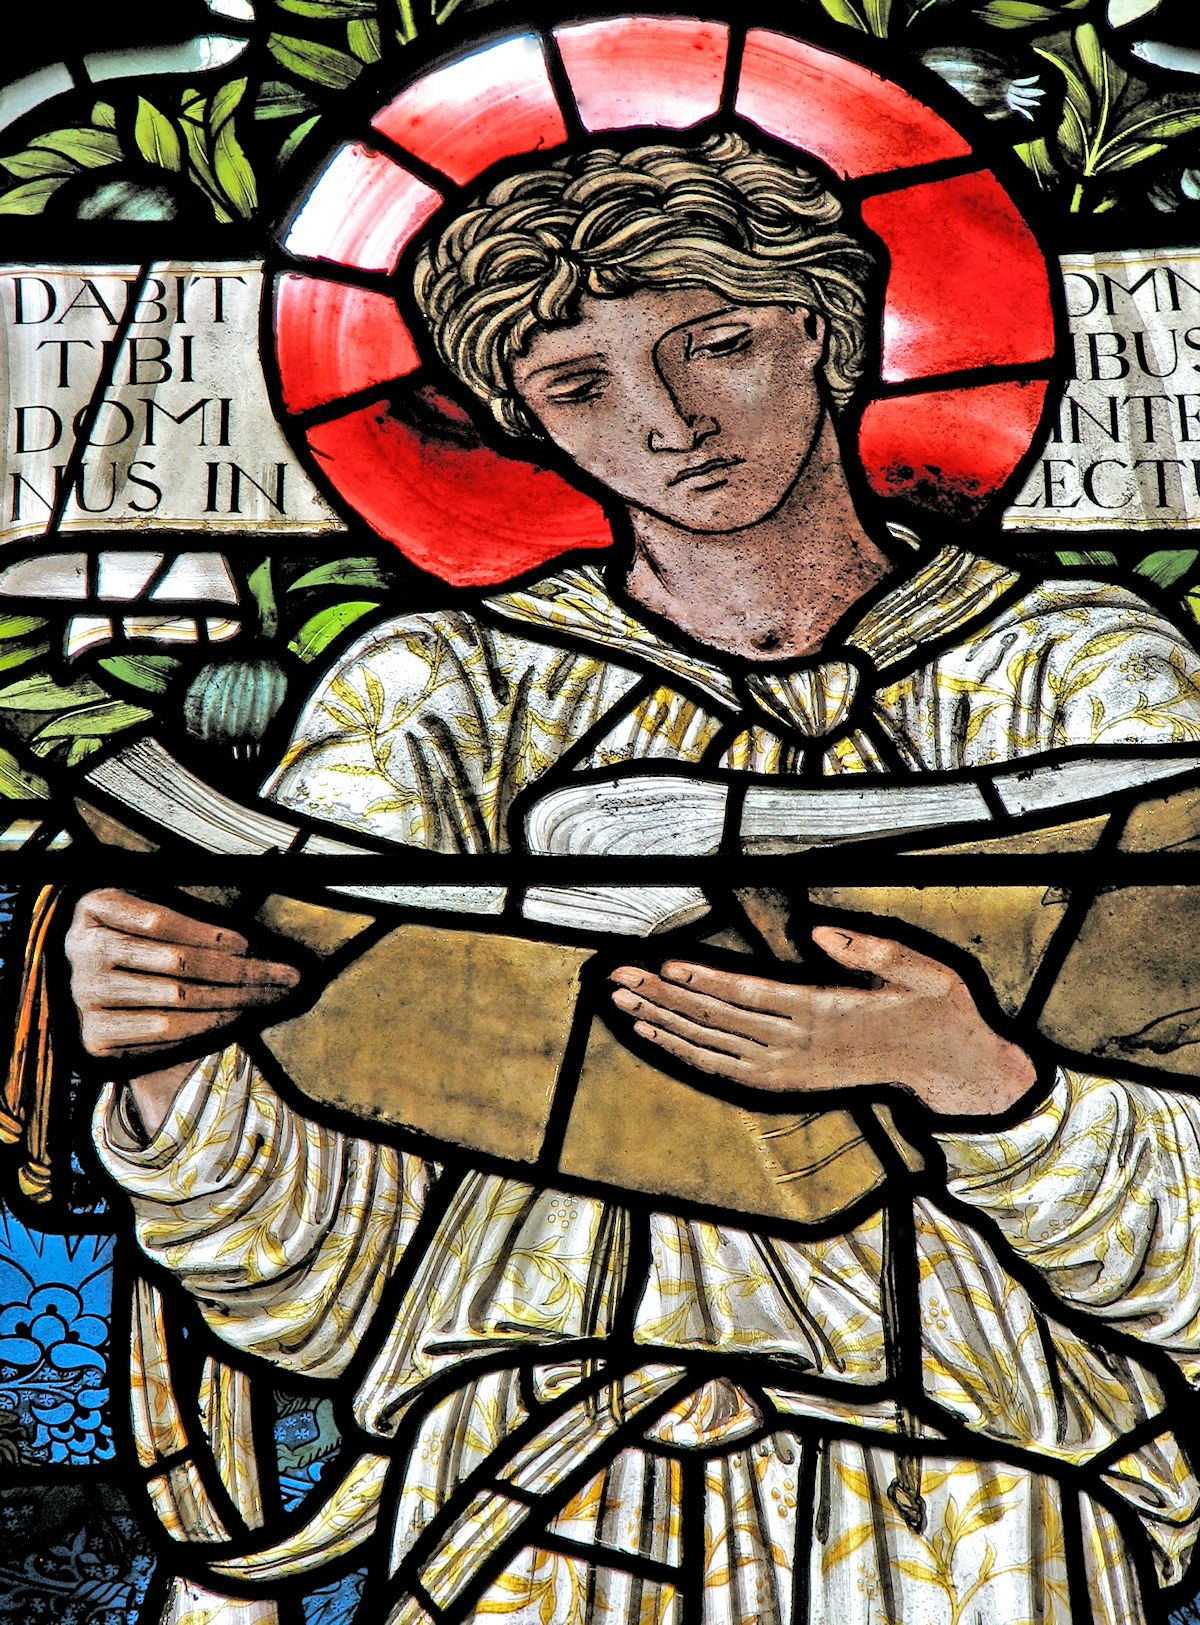 00 St Timothy. 04.02.13